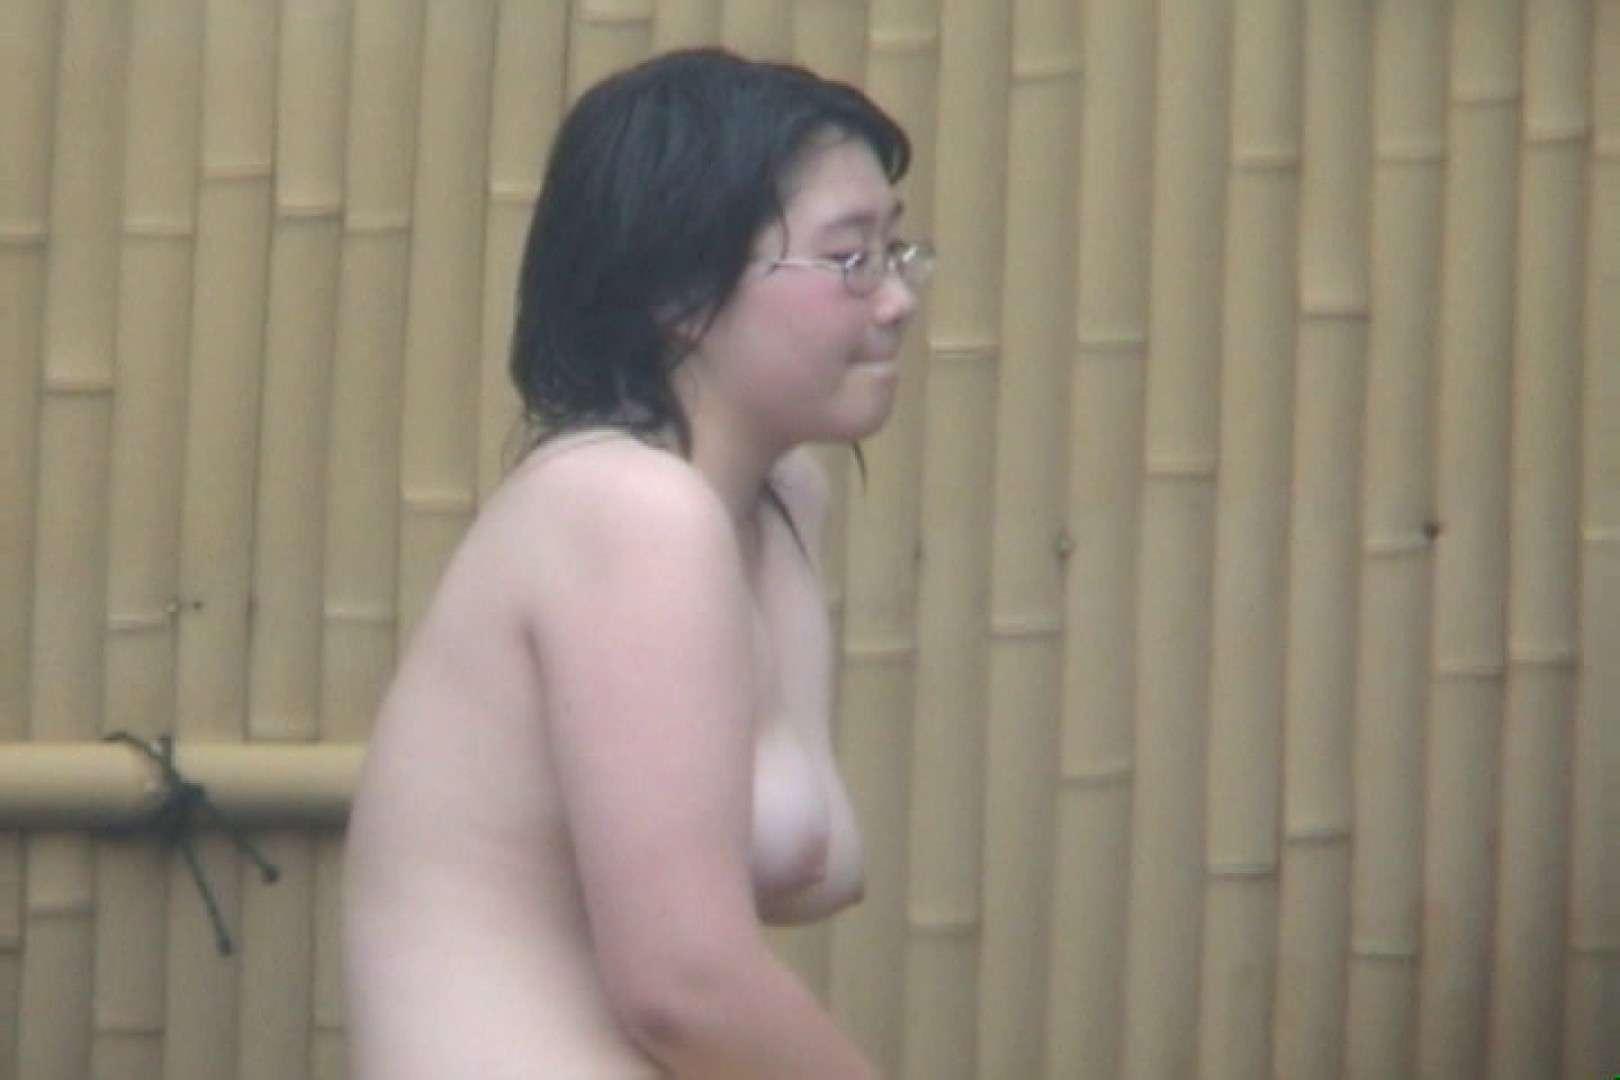 Aquaな露天風呂Vol.46【VIP限定】 露天風呂突入 | 盗撮師作品  76pic 40